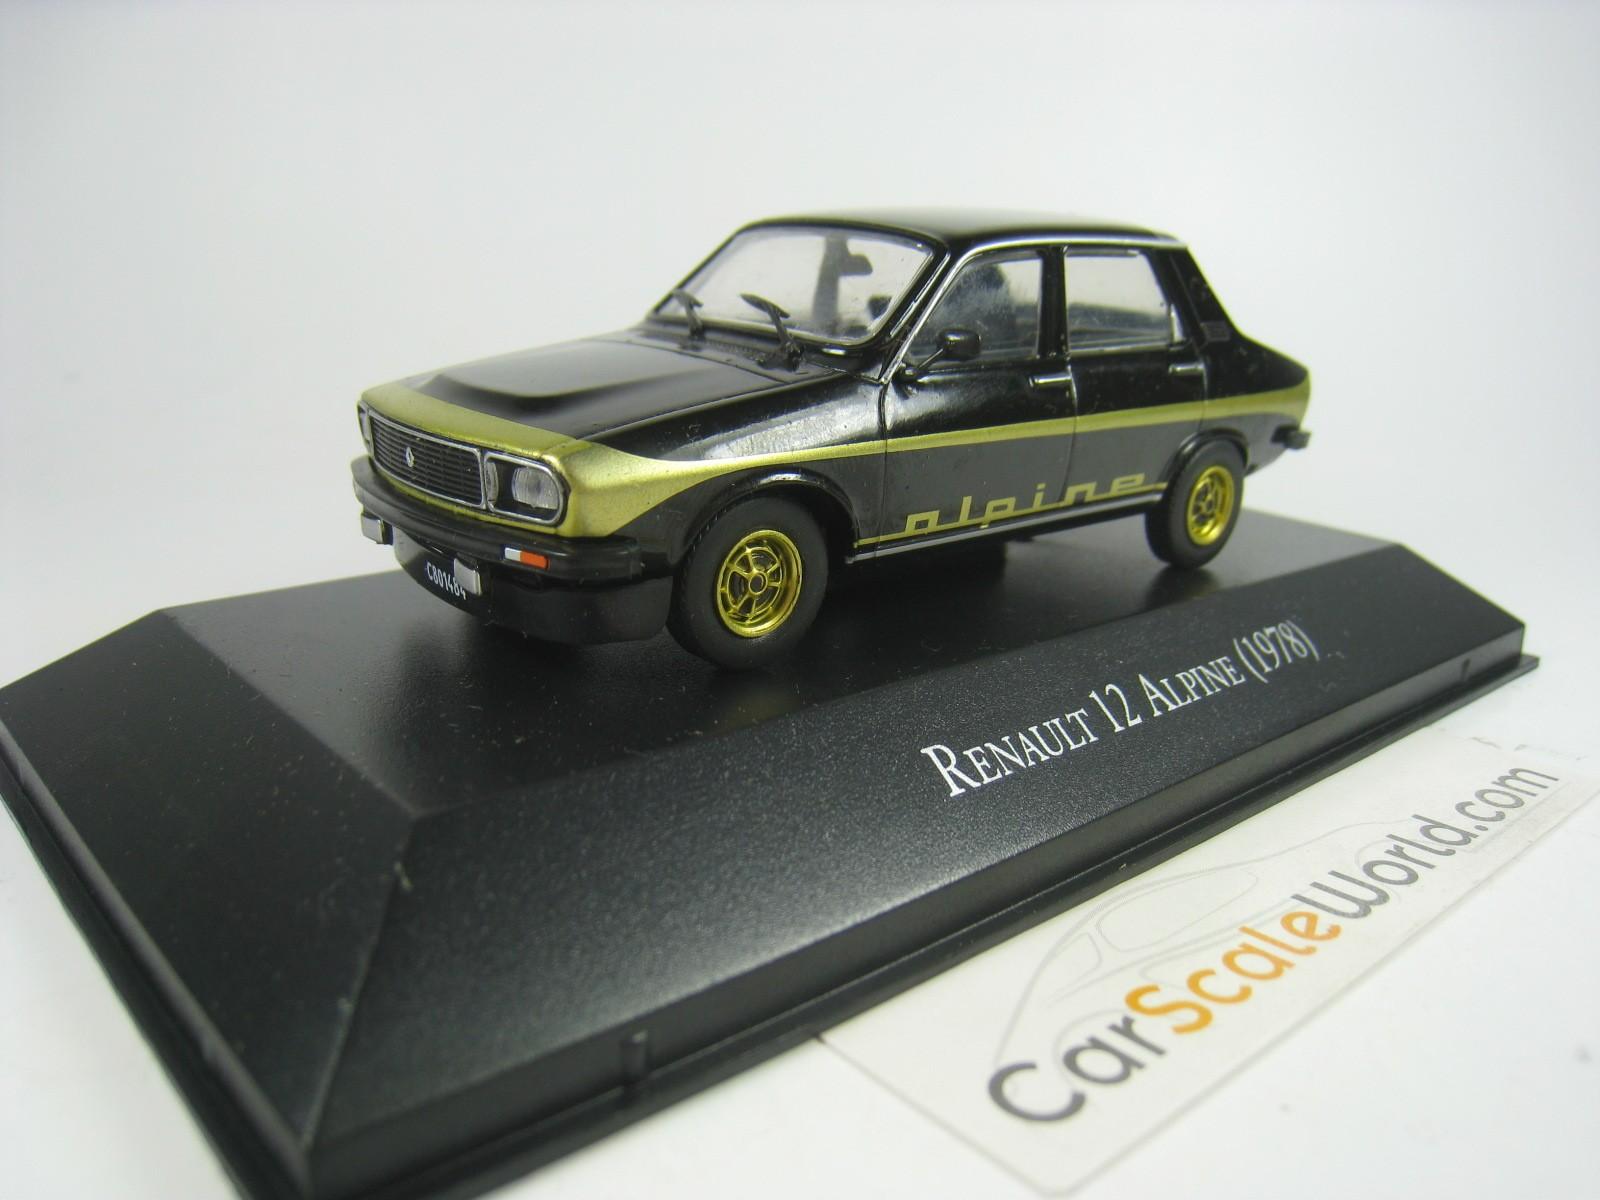 Renault de 110 1300 Alpine 1971 VQ29 Coche 1//24 Salvat Modelos